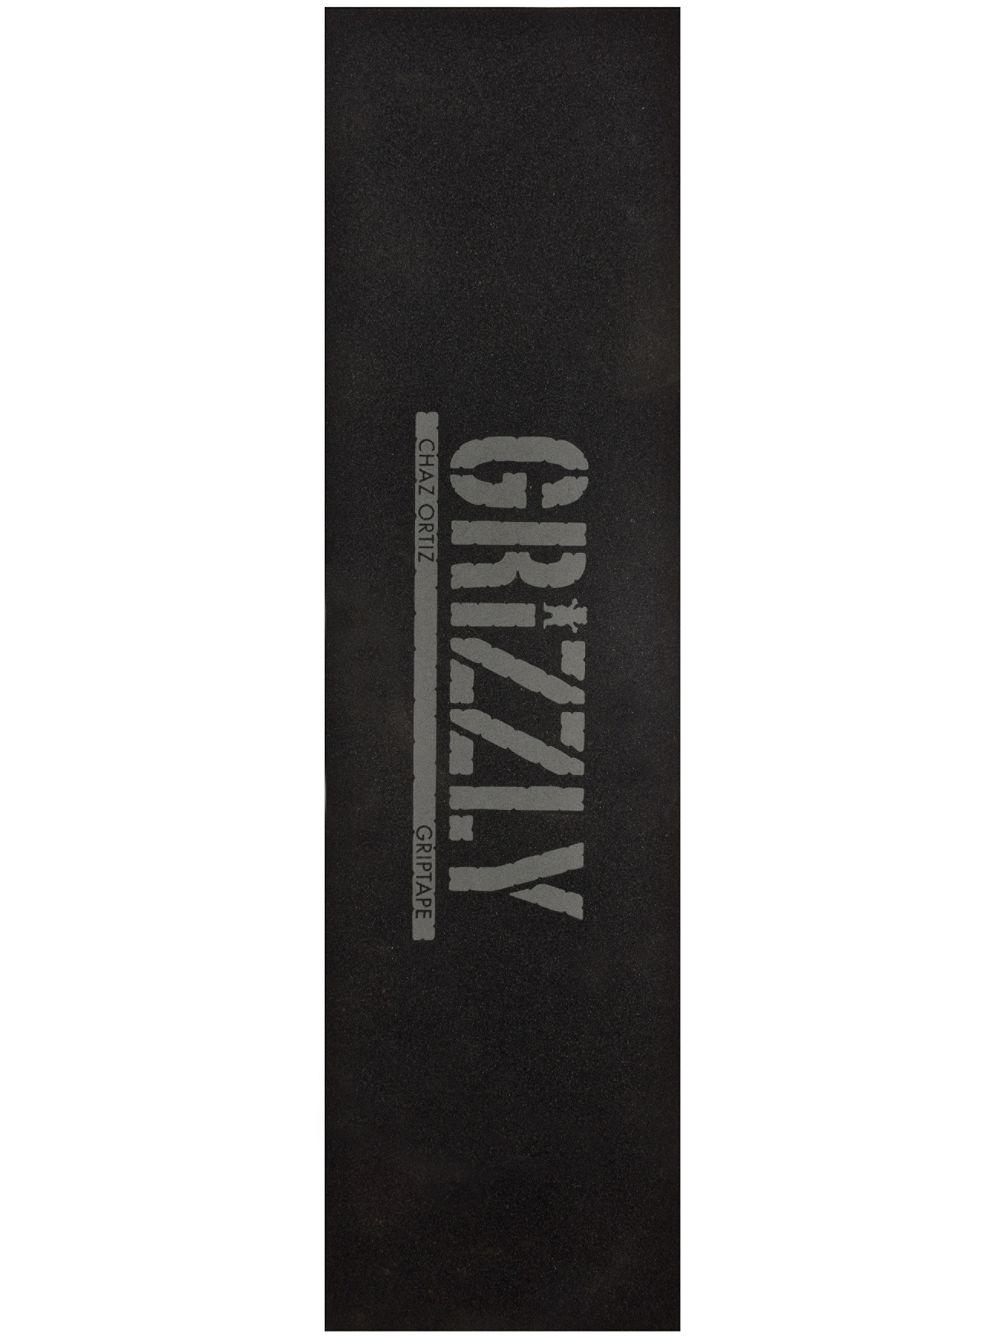 grizzly-chaz-ortiz-3m-reflective-griptape